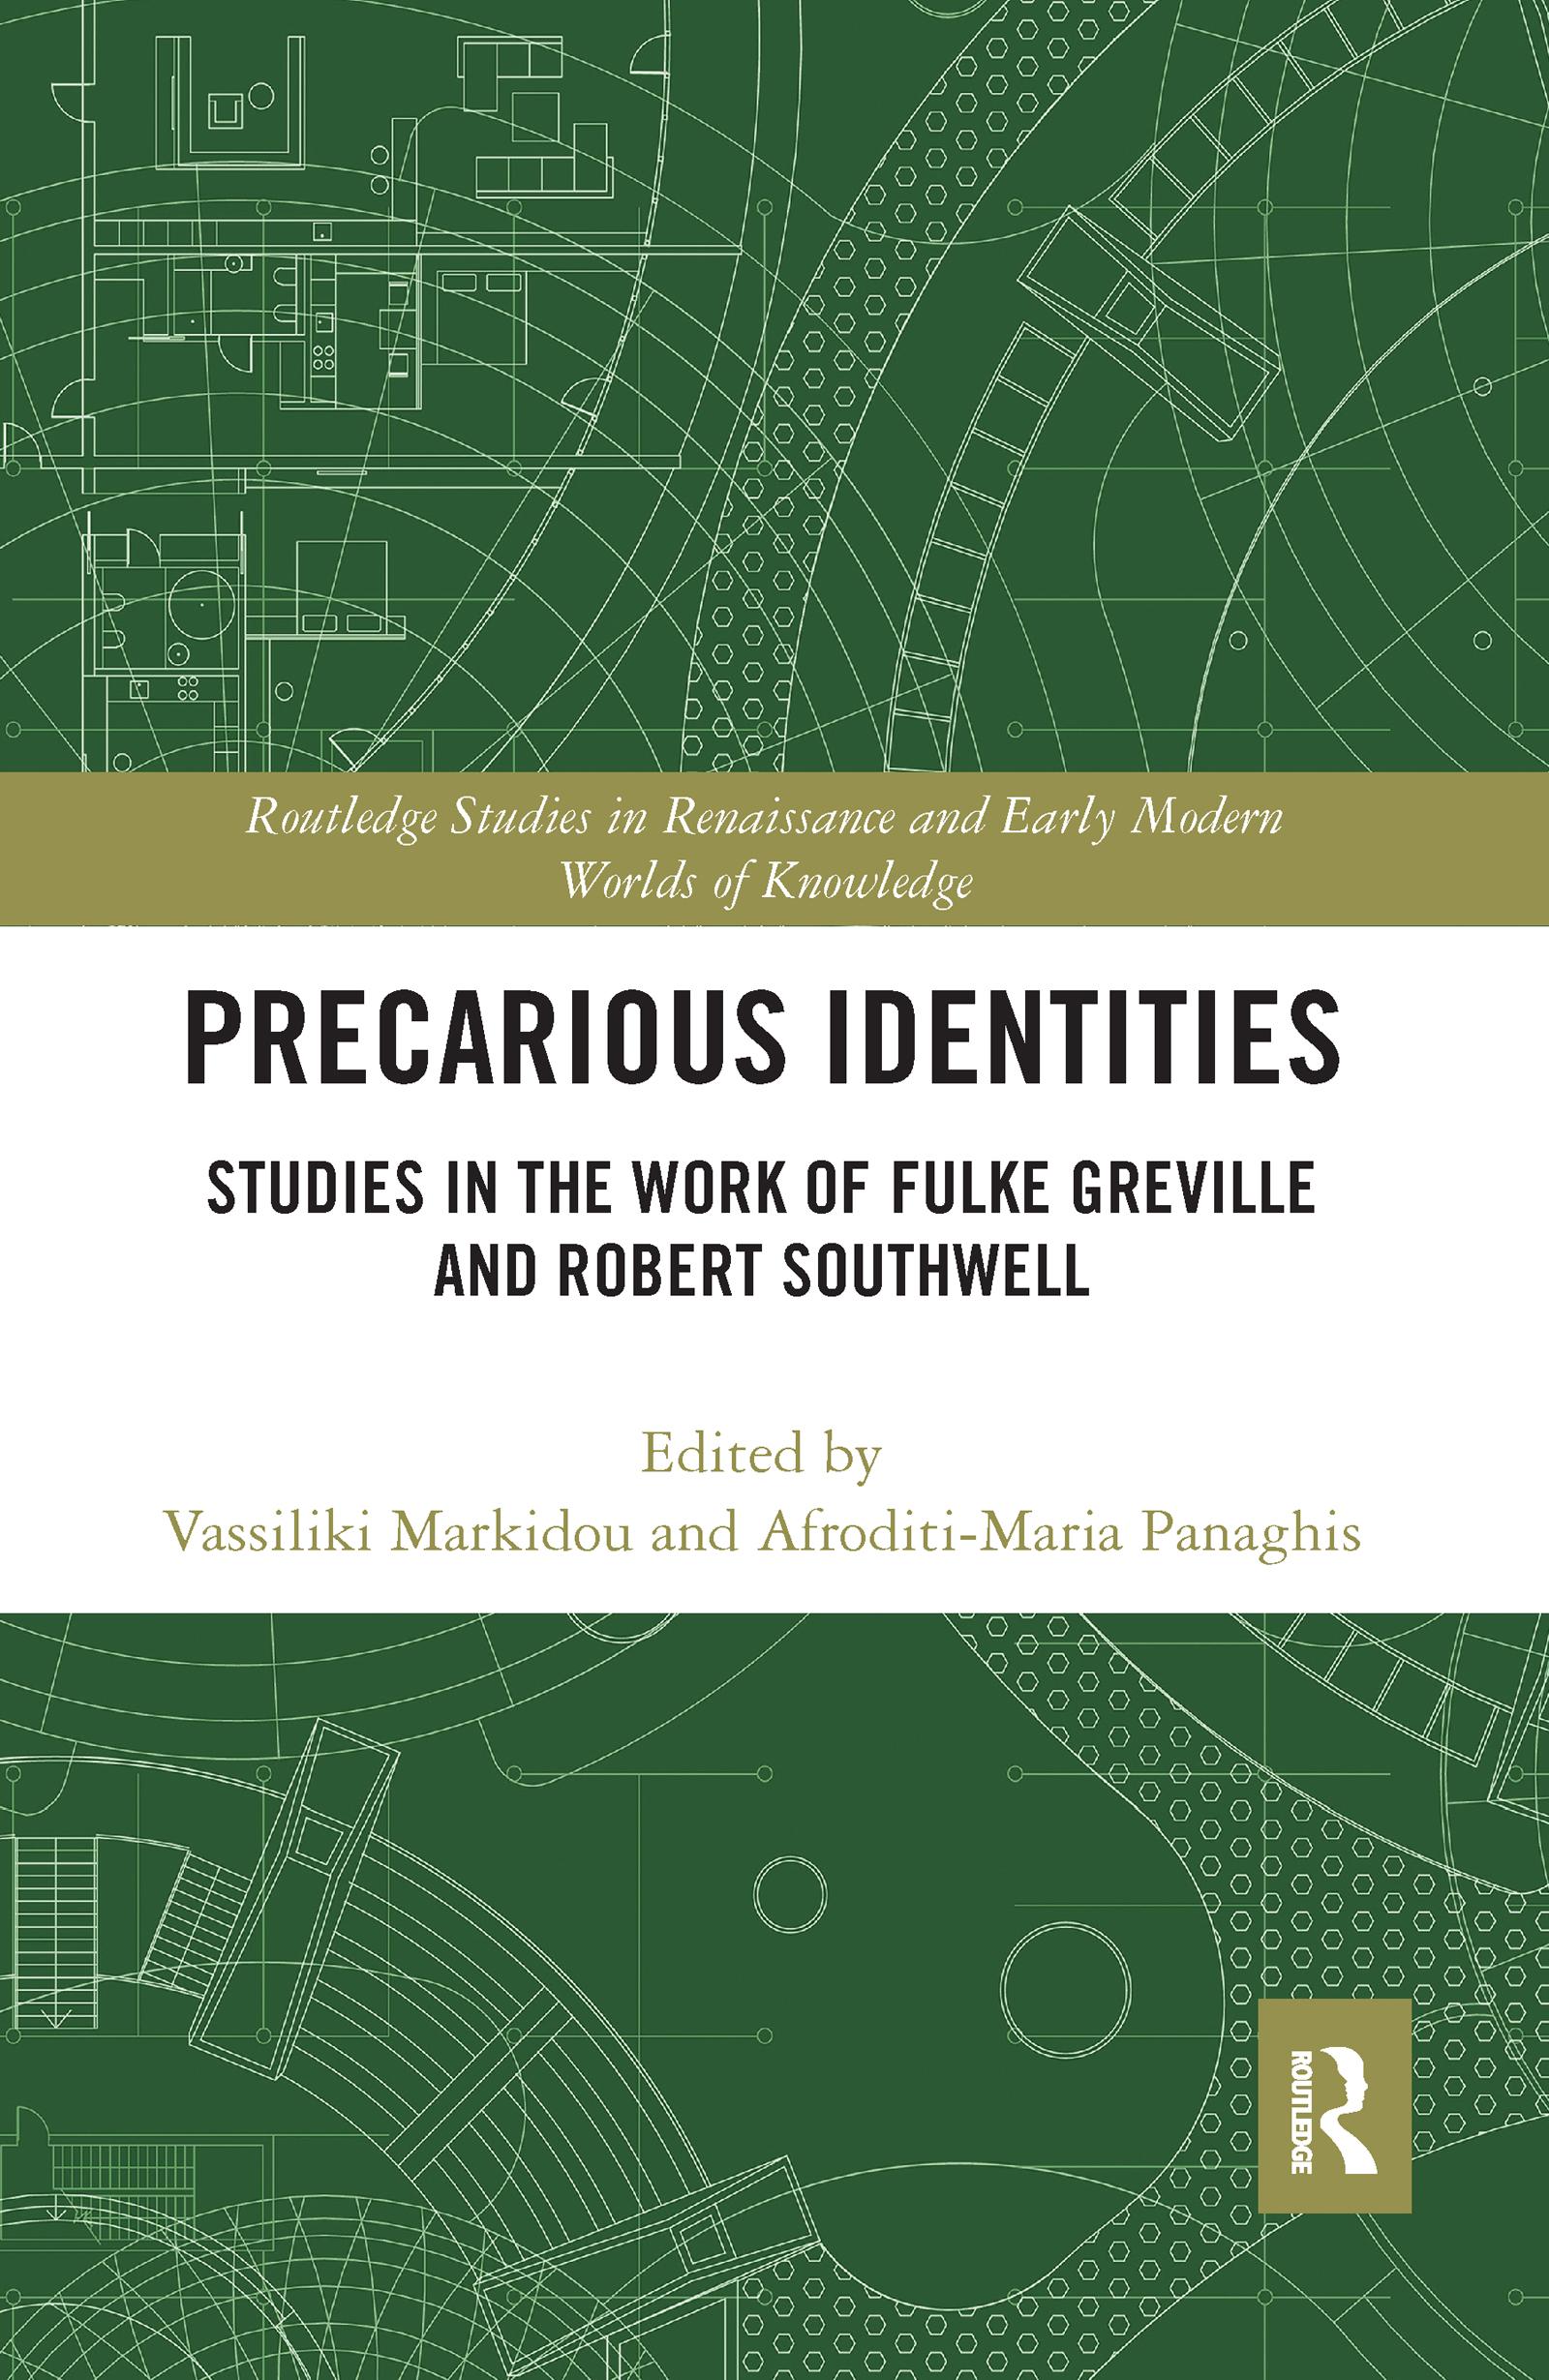 Precarious Identities